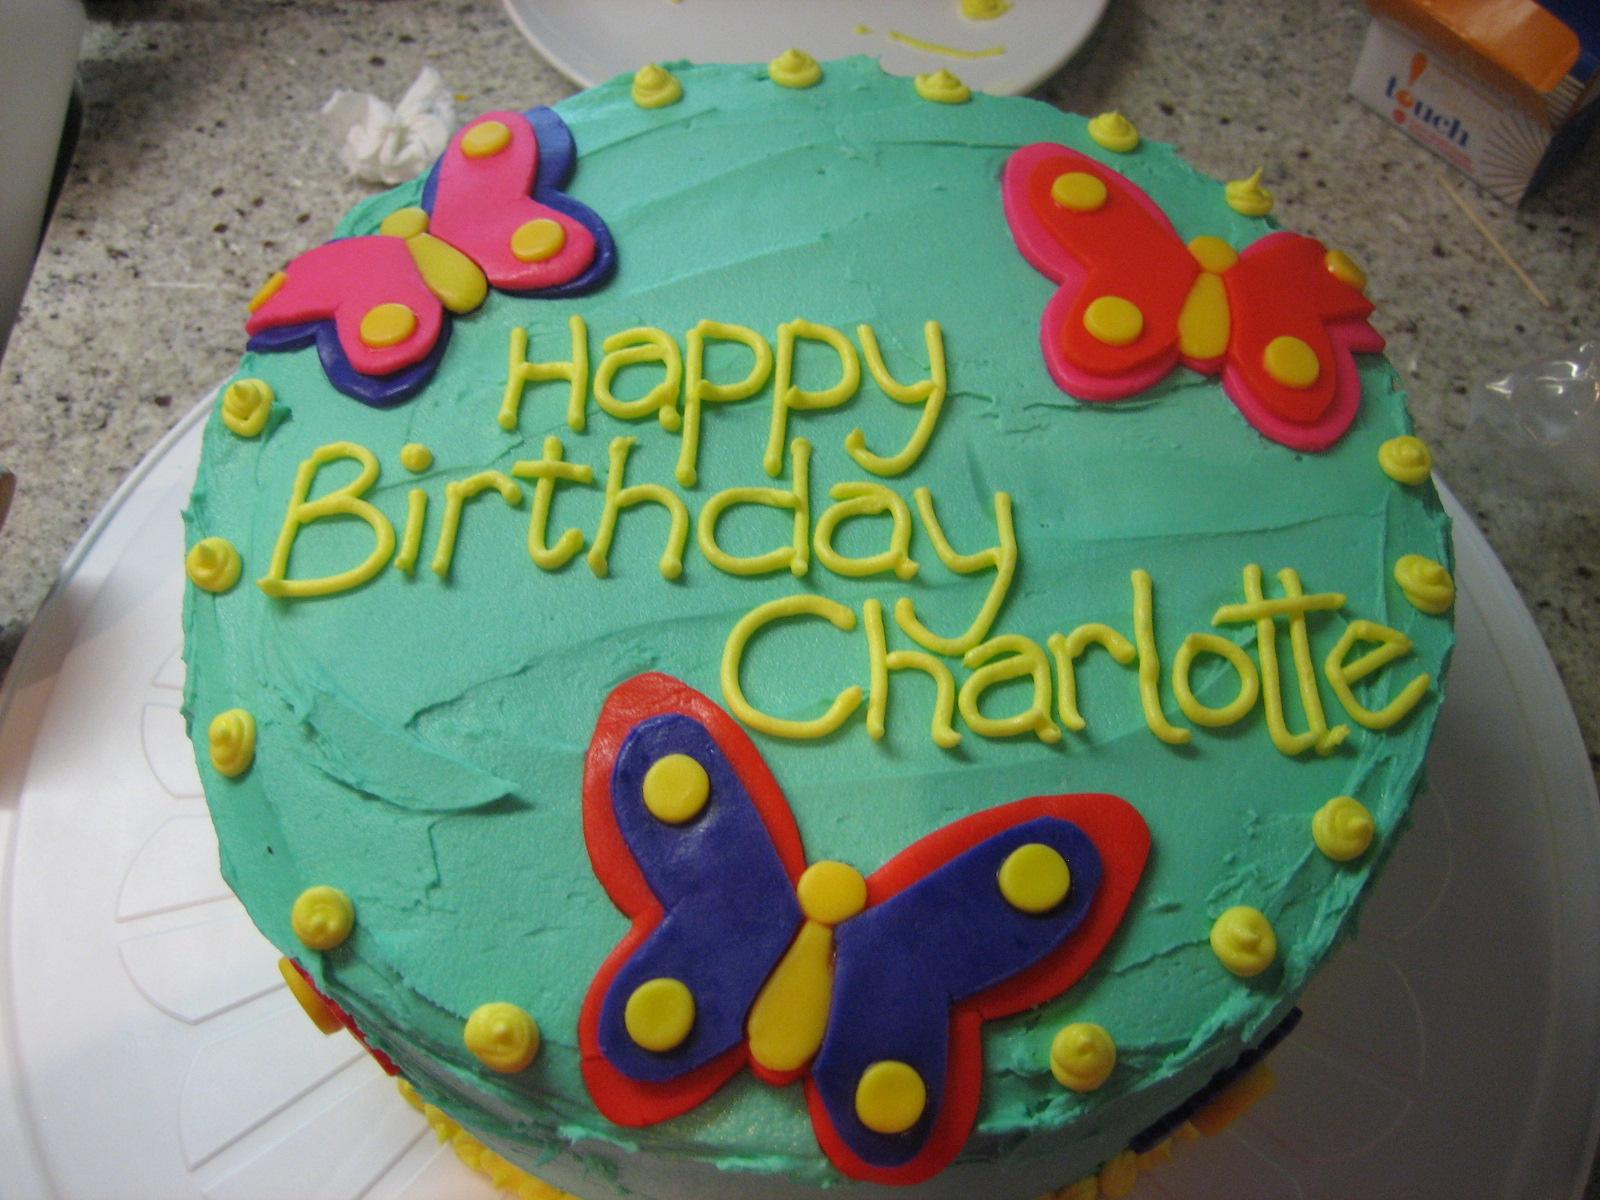 Charlottes 3rd Birthday Cake